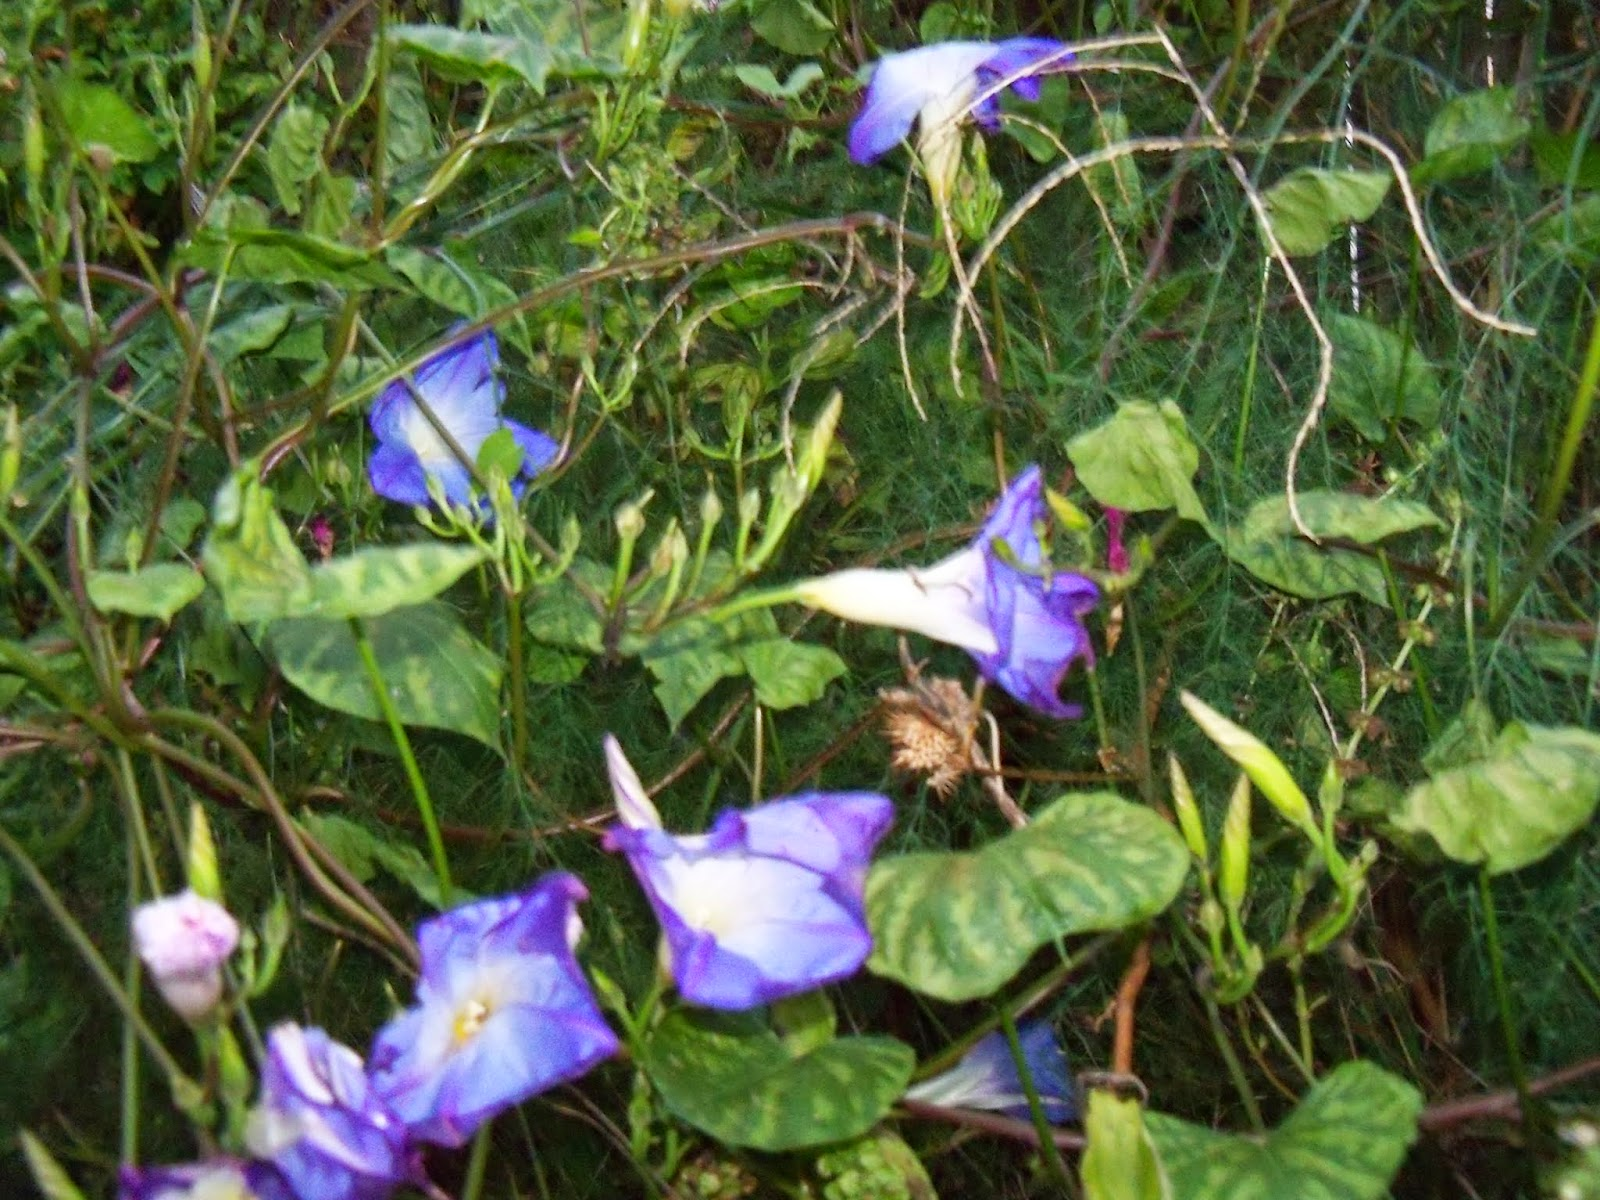 Gardening 2014 - 116_5263.JPG